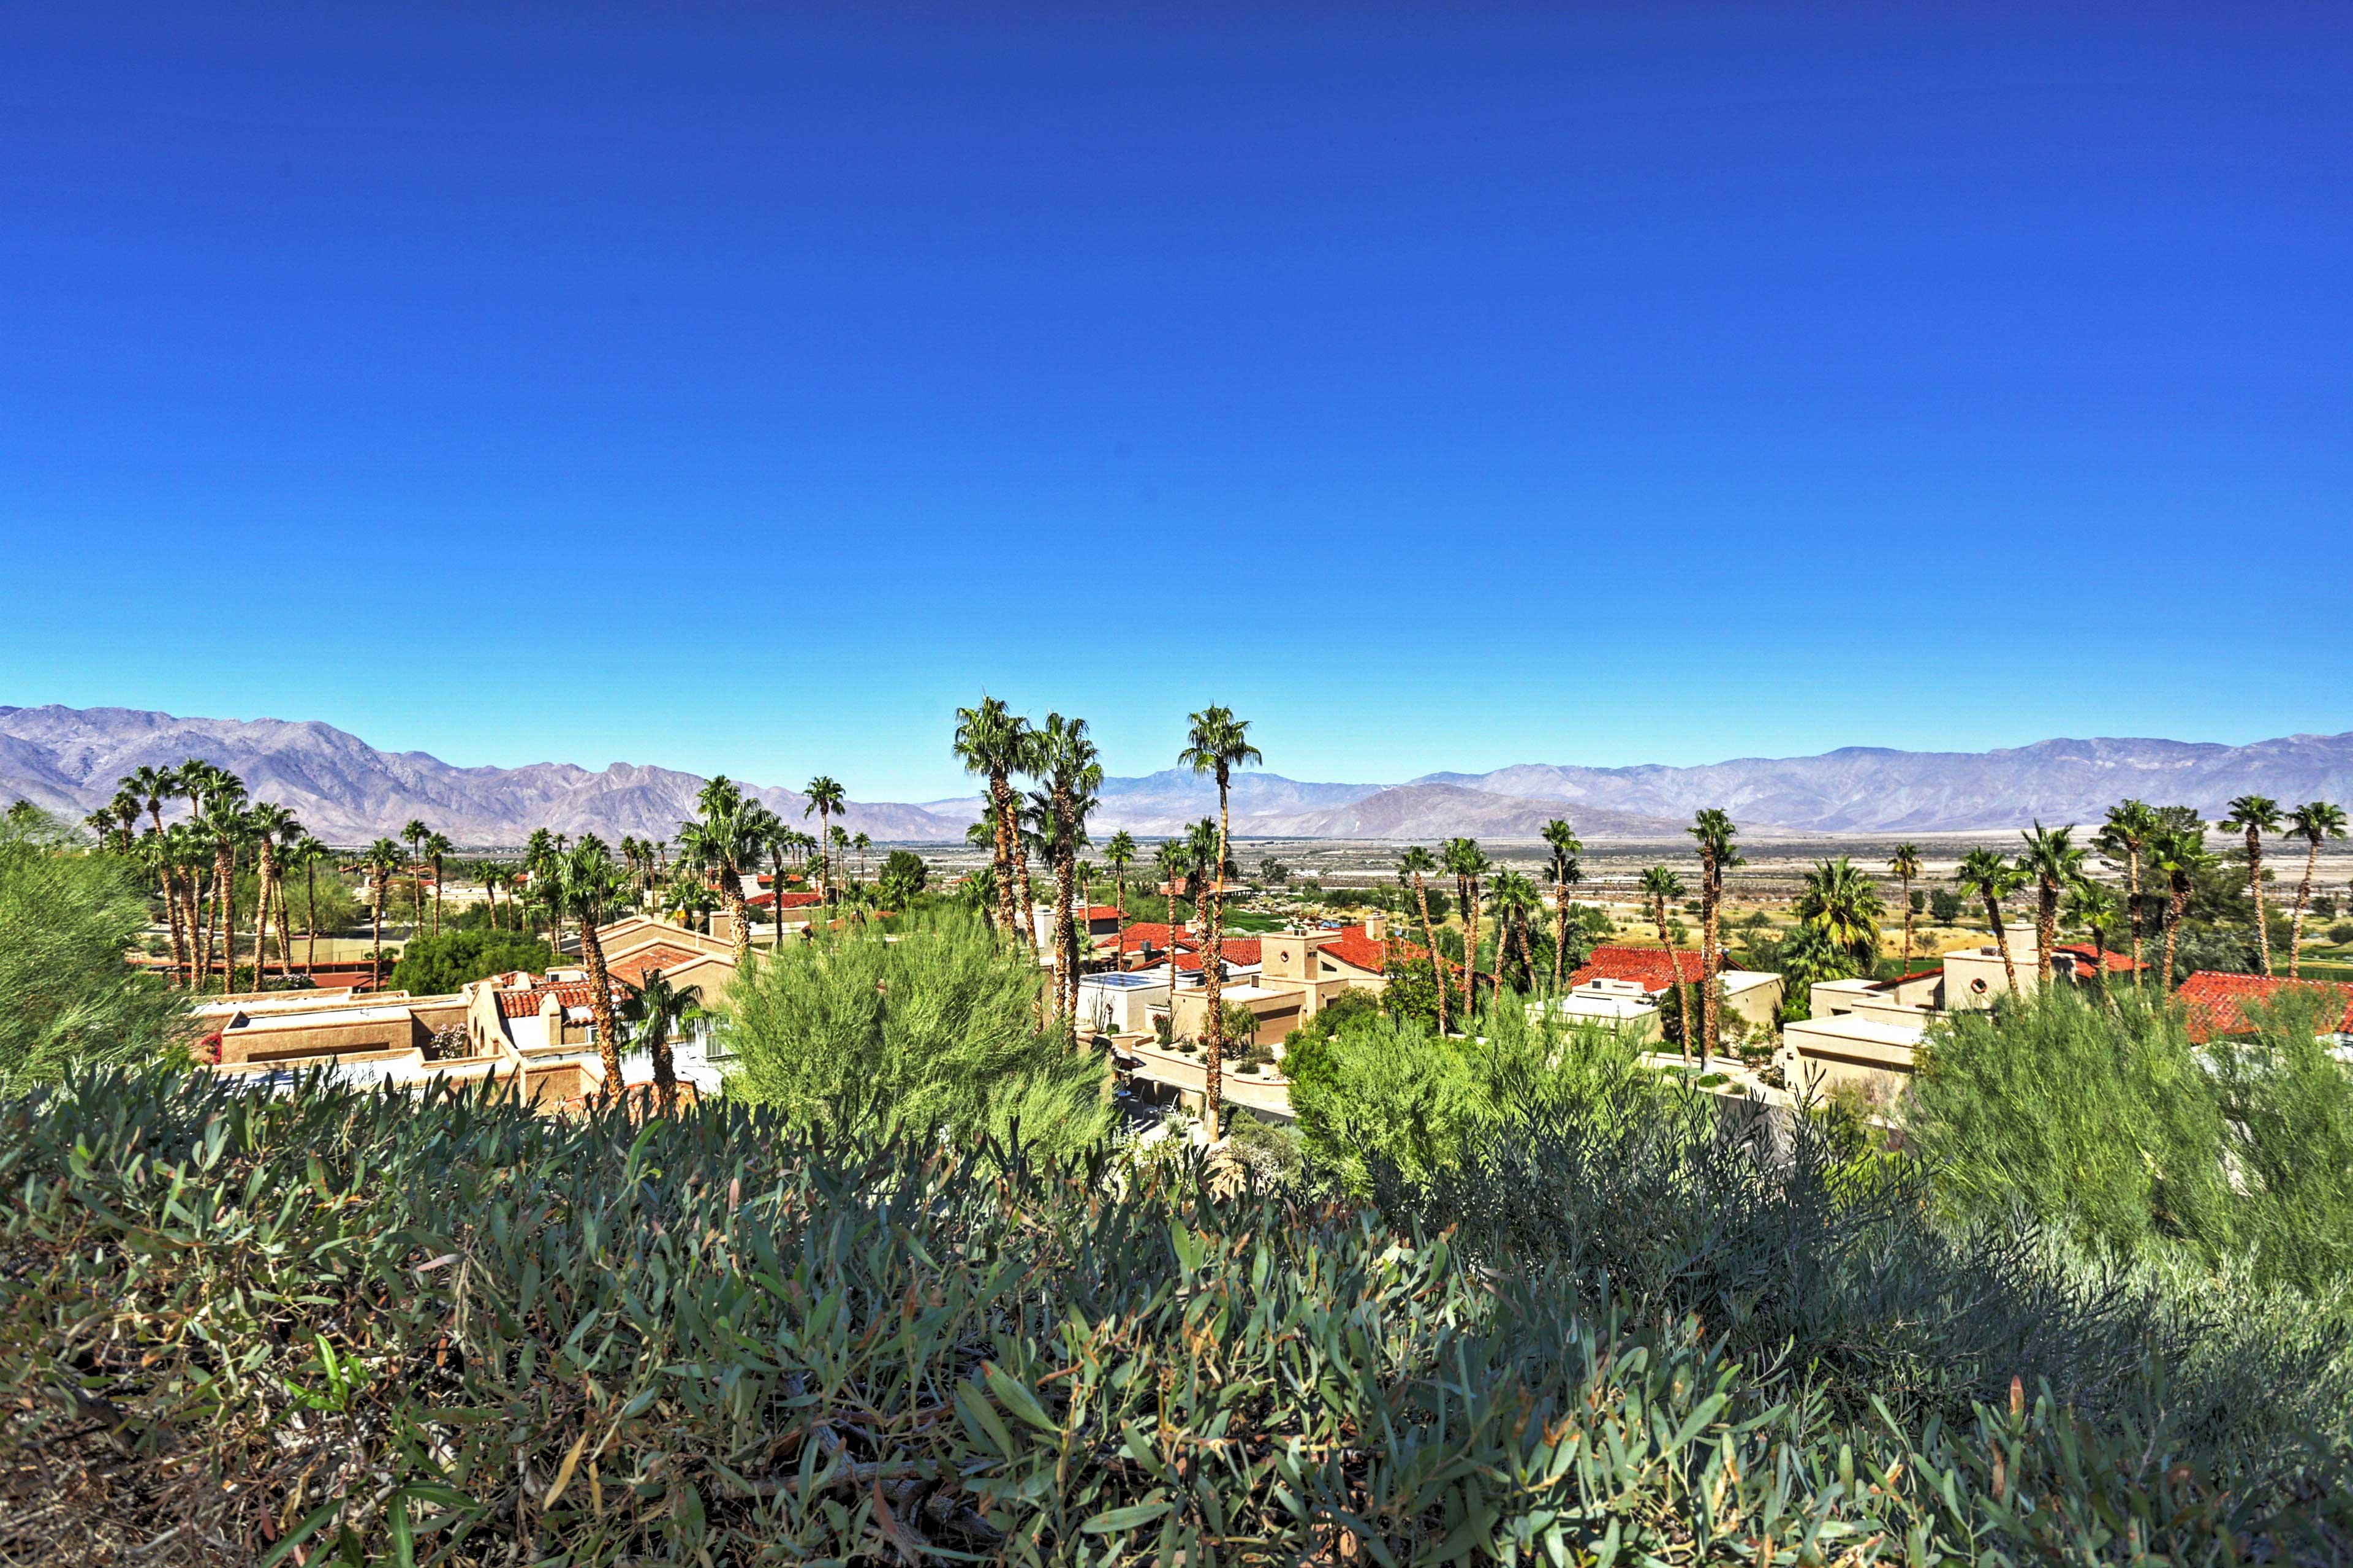 Enjoy stunning views from the backyard!